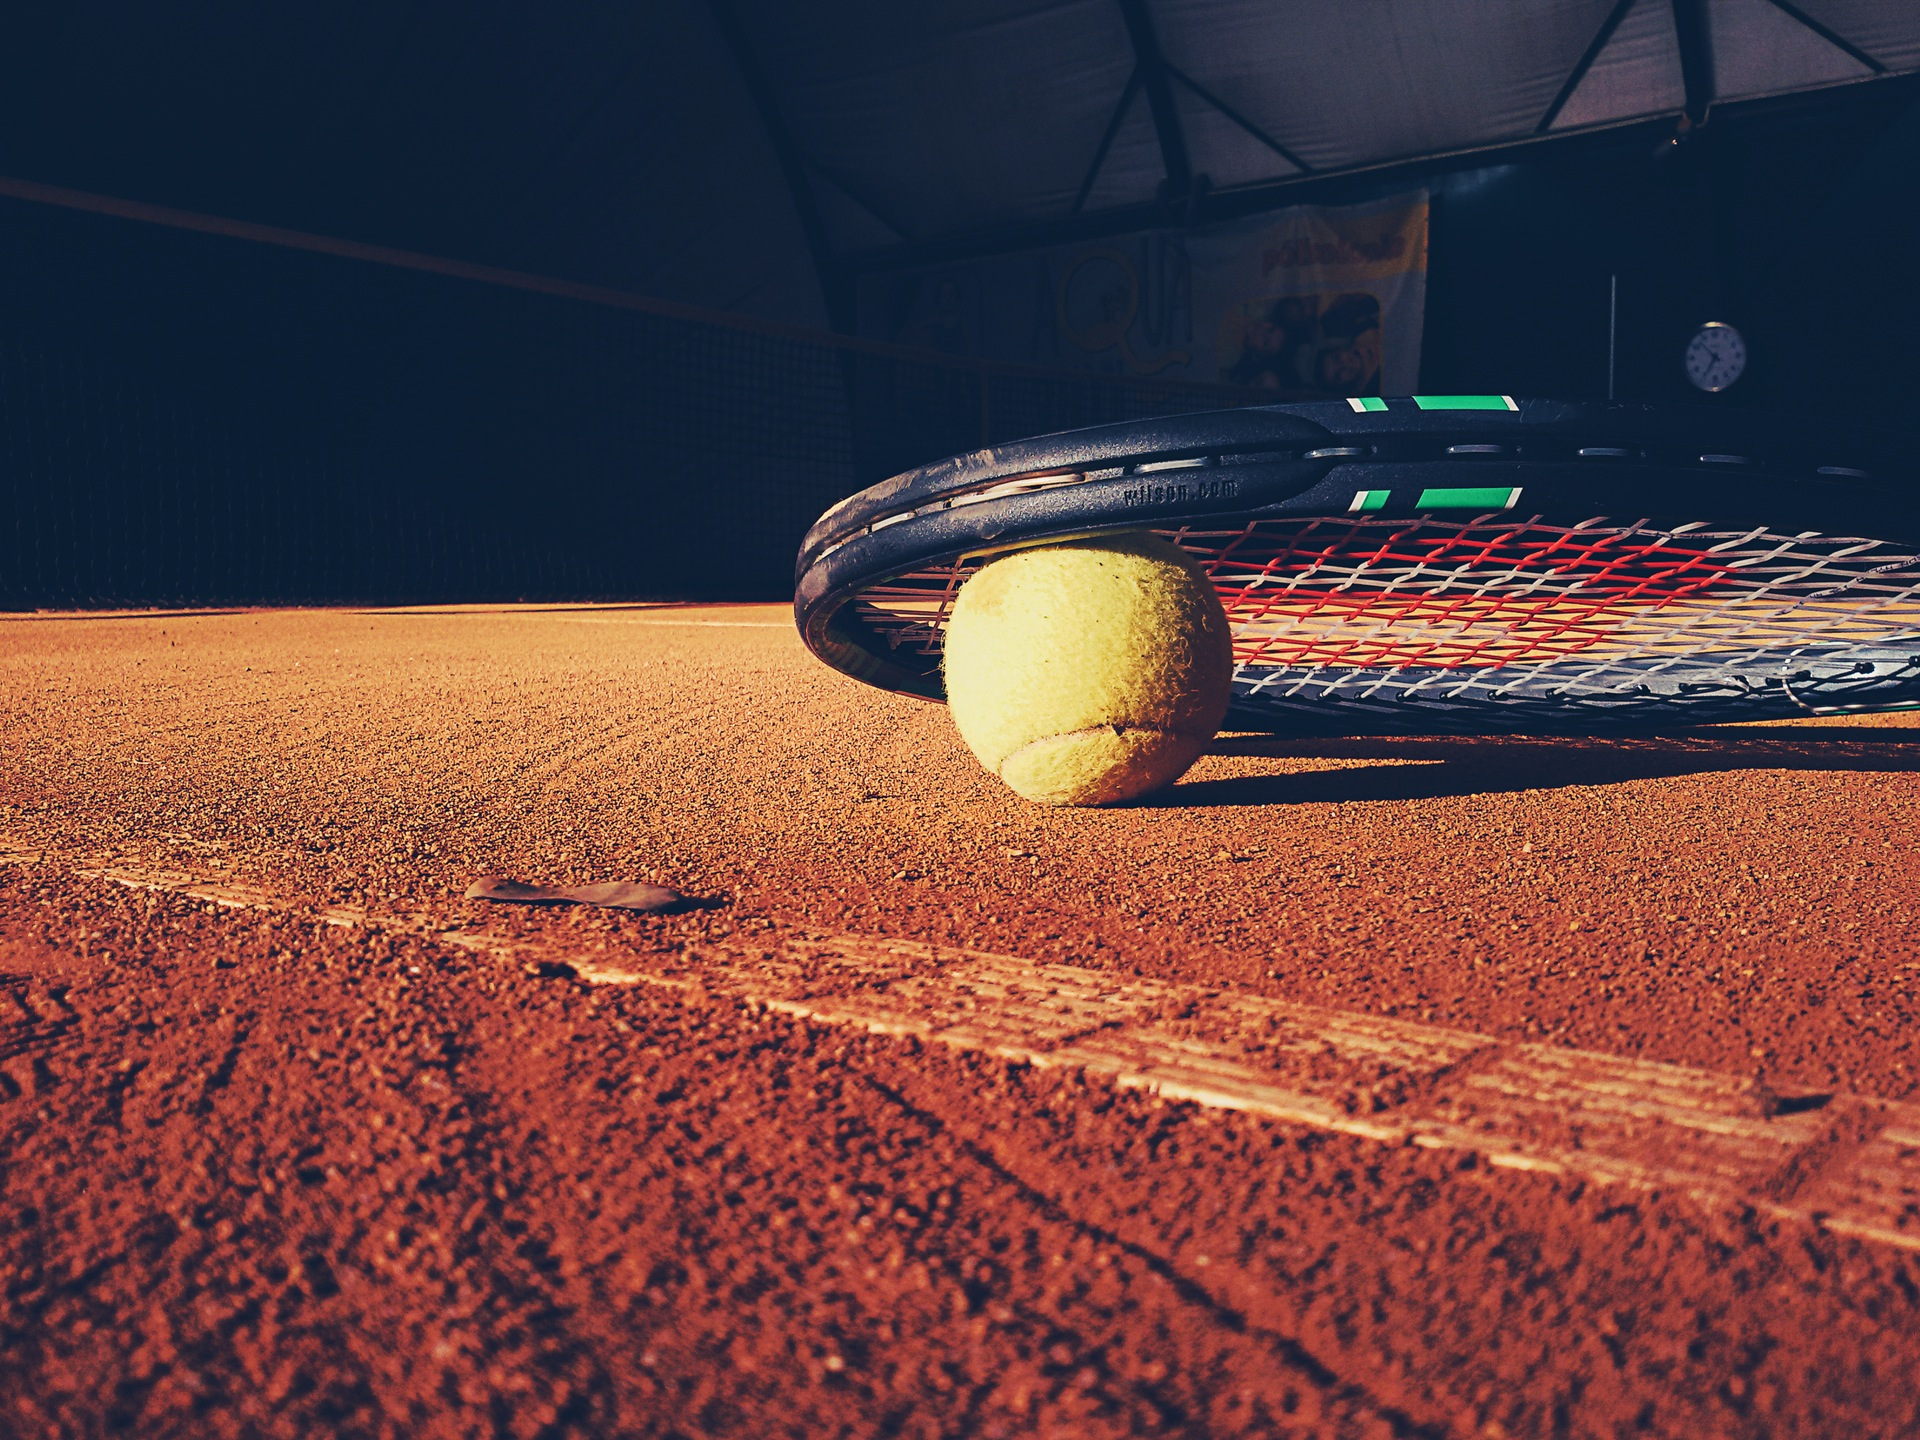 balle de tennis, Tennis, raquette, Court de tennis, sable, Ball, domaine - Fonds d'écran HD - Professor-falken.com